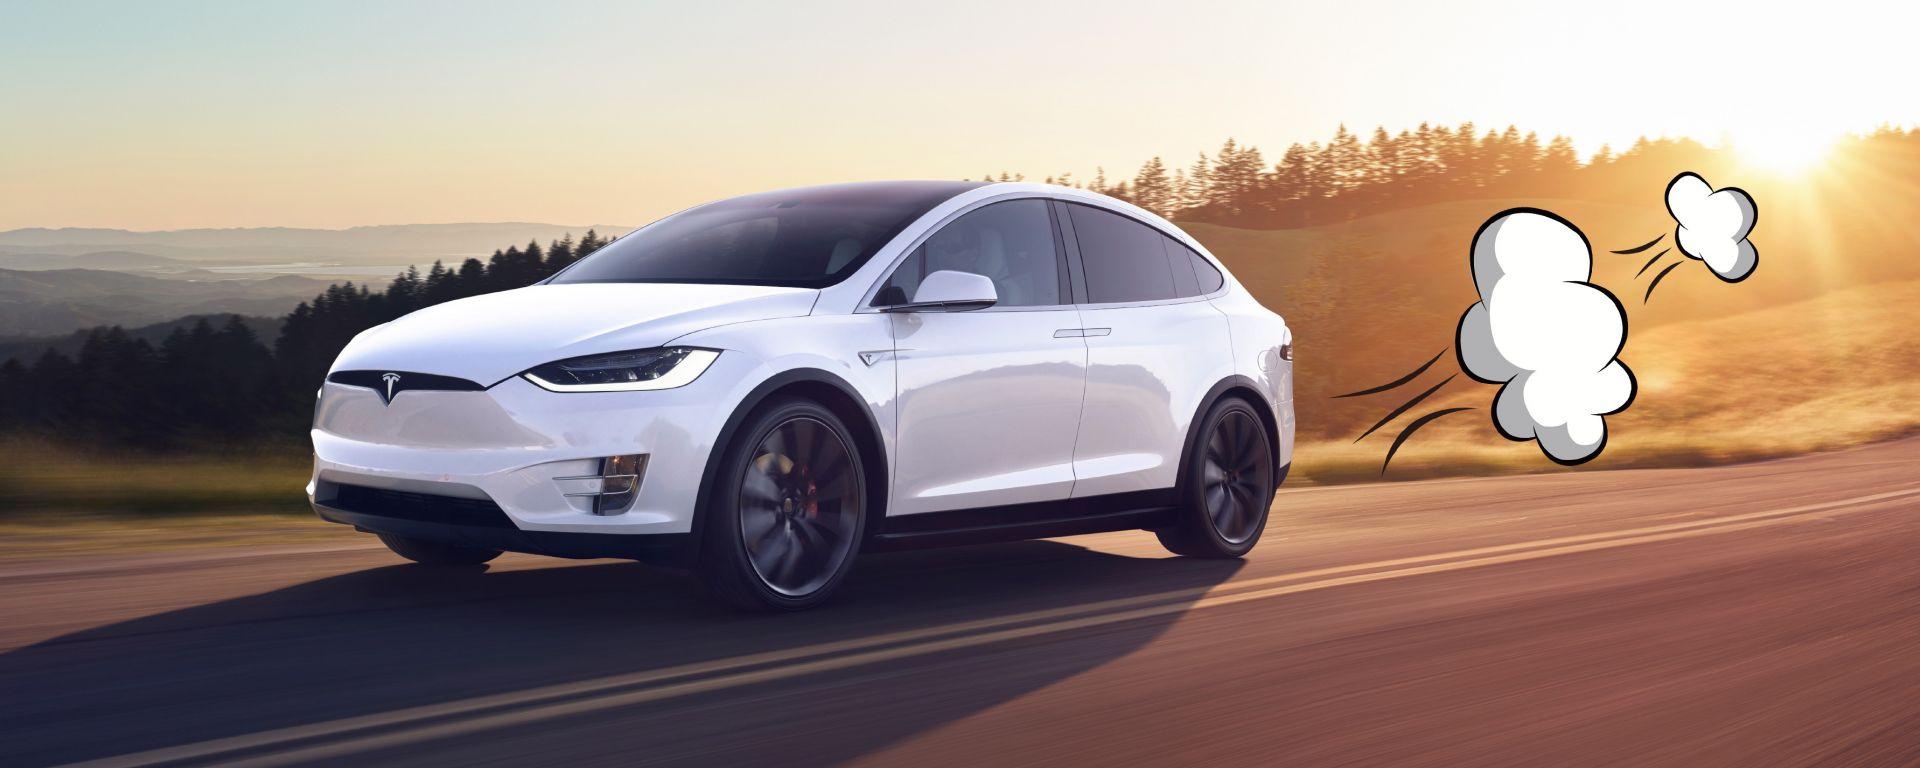 Tesla, arriva la modalità Boombox